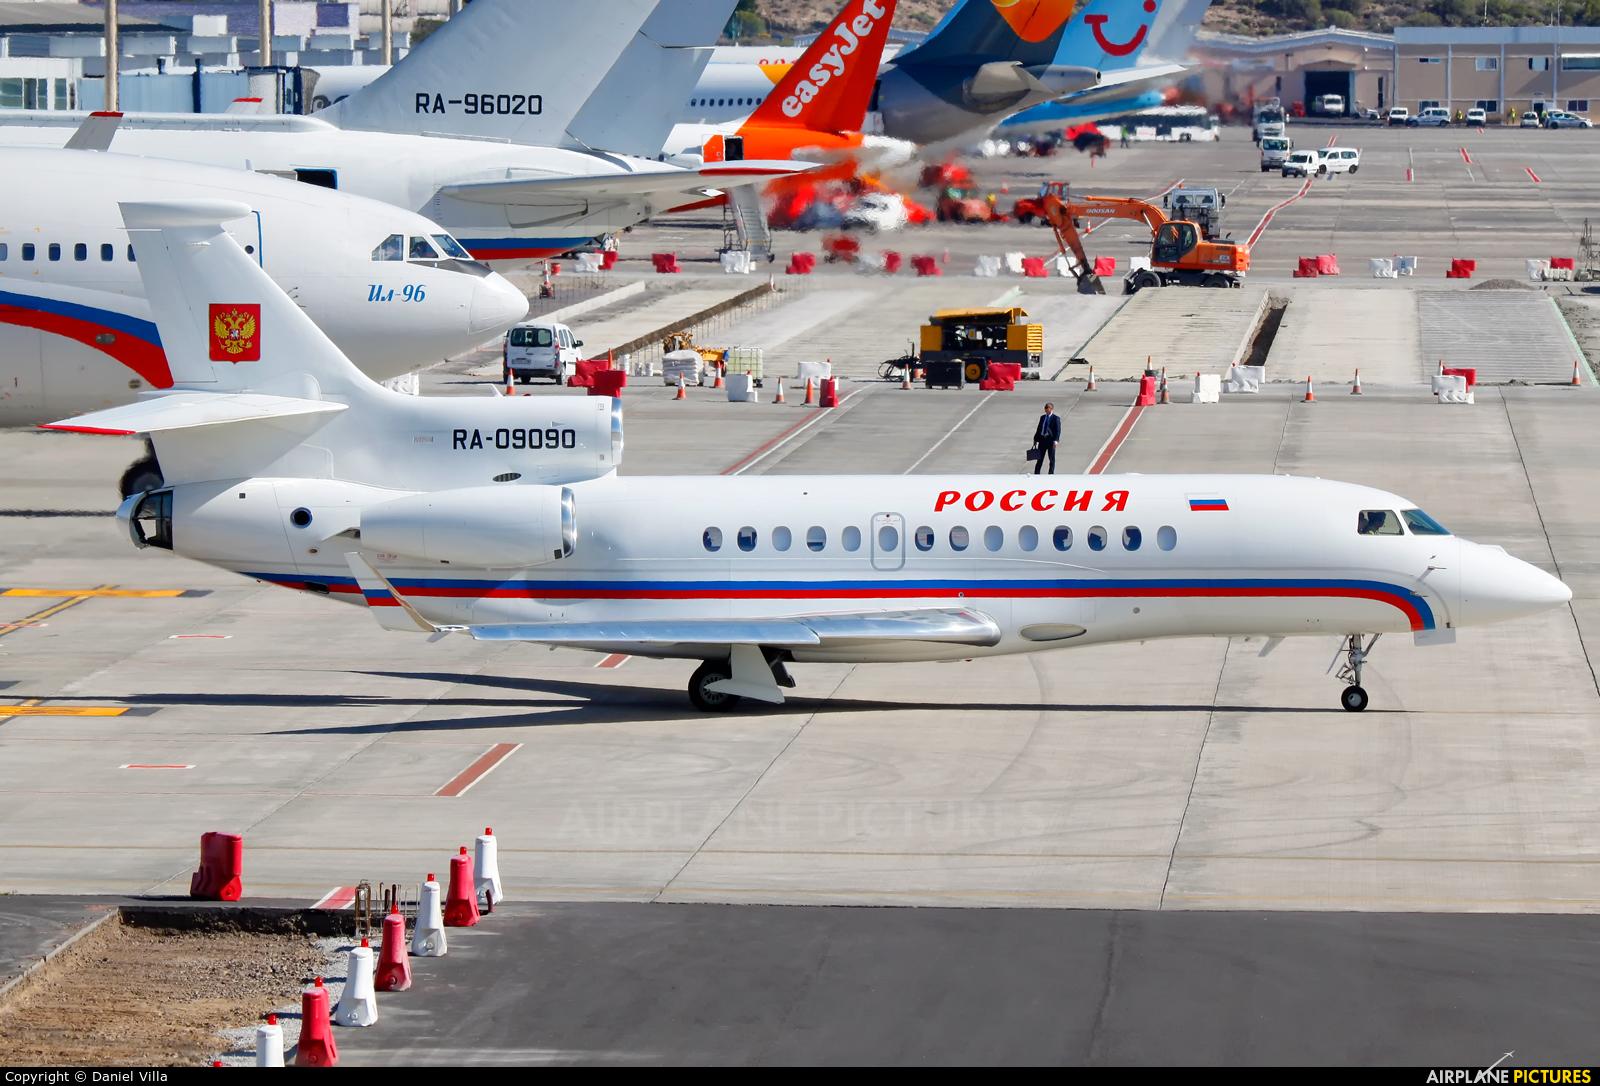 Rossiya Special Flight Detachment RA-09090 aircraft at Tenerife Sur - Reina Sofia